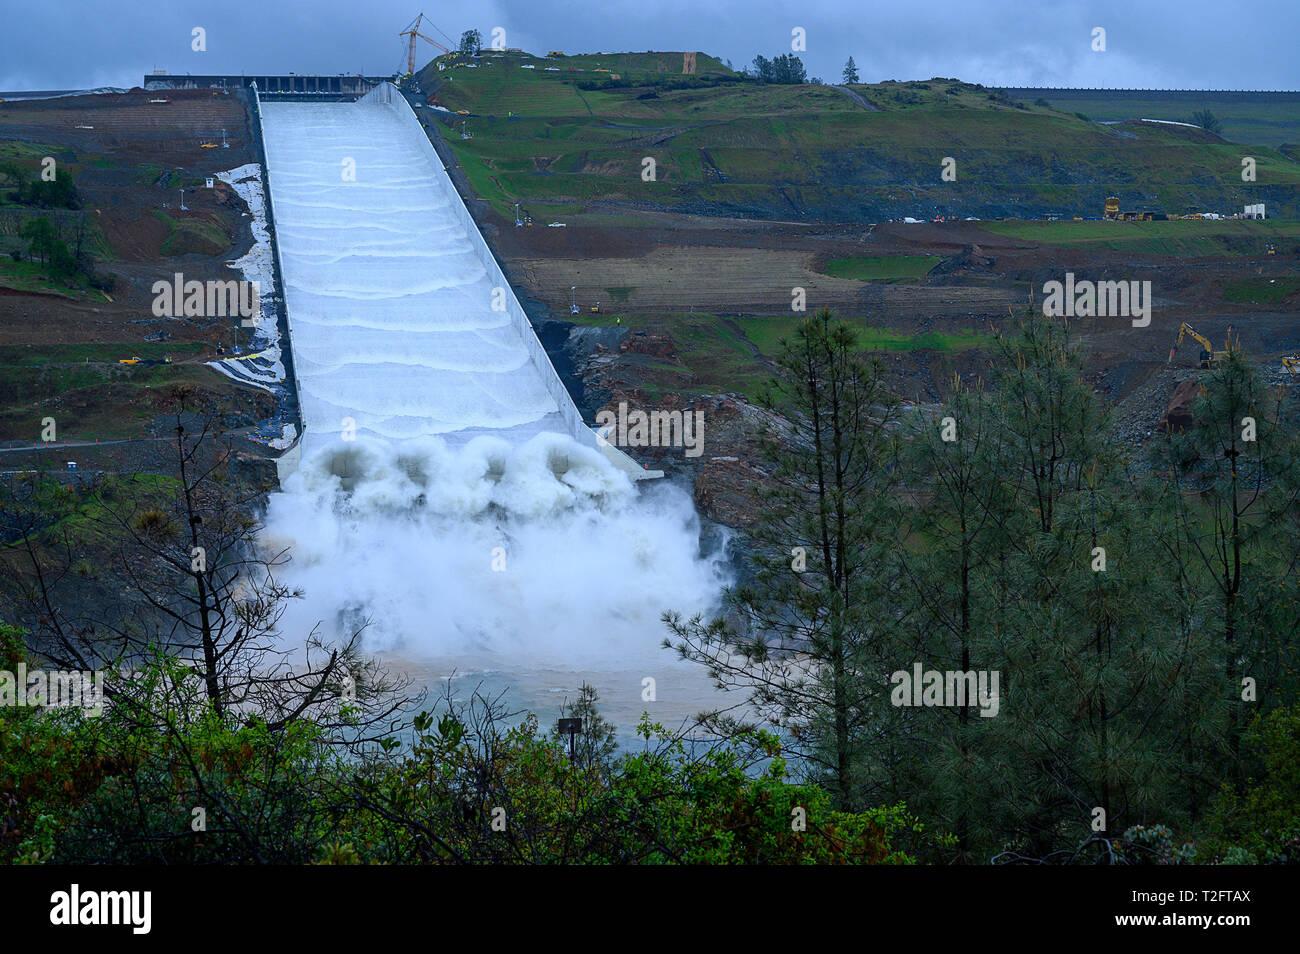 Oroville Dam Spillway Stock Photos & Oroville Dam Spillway Stock